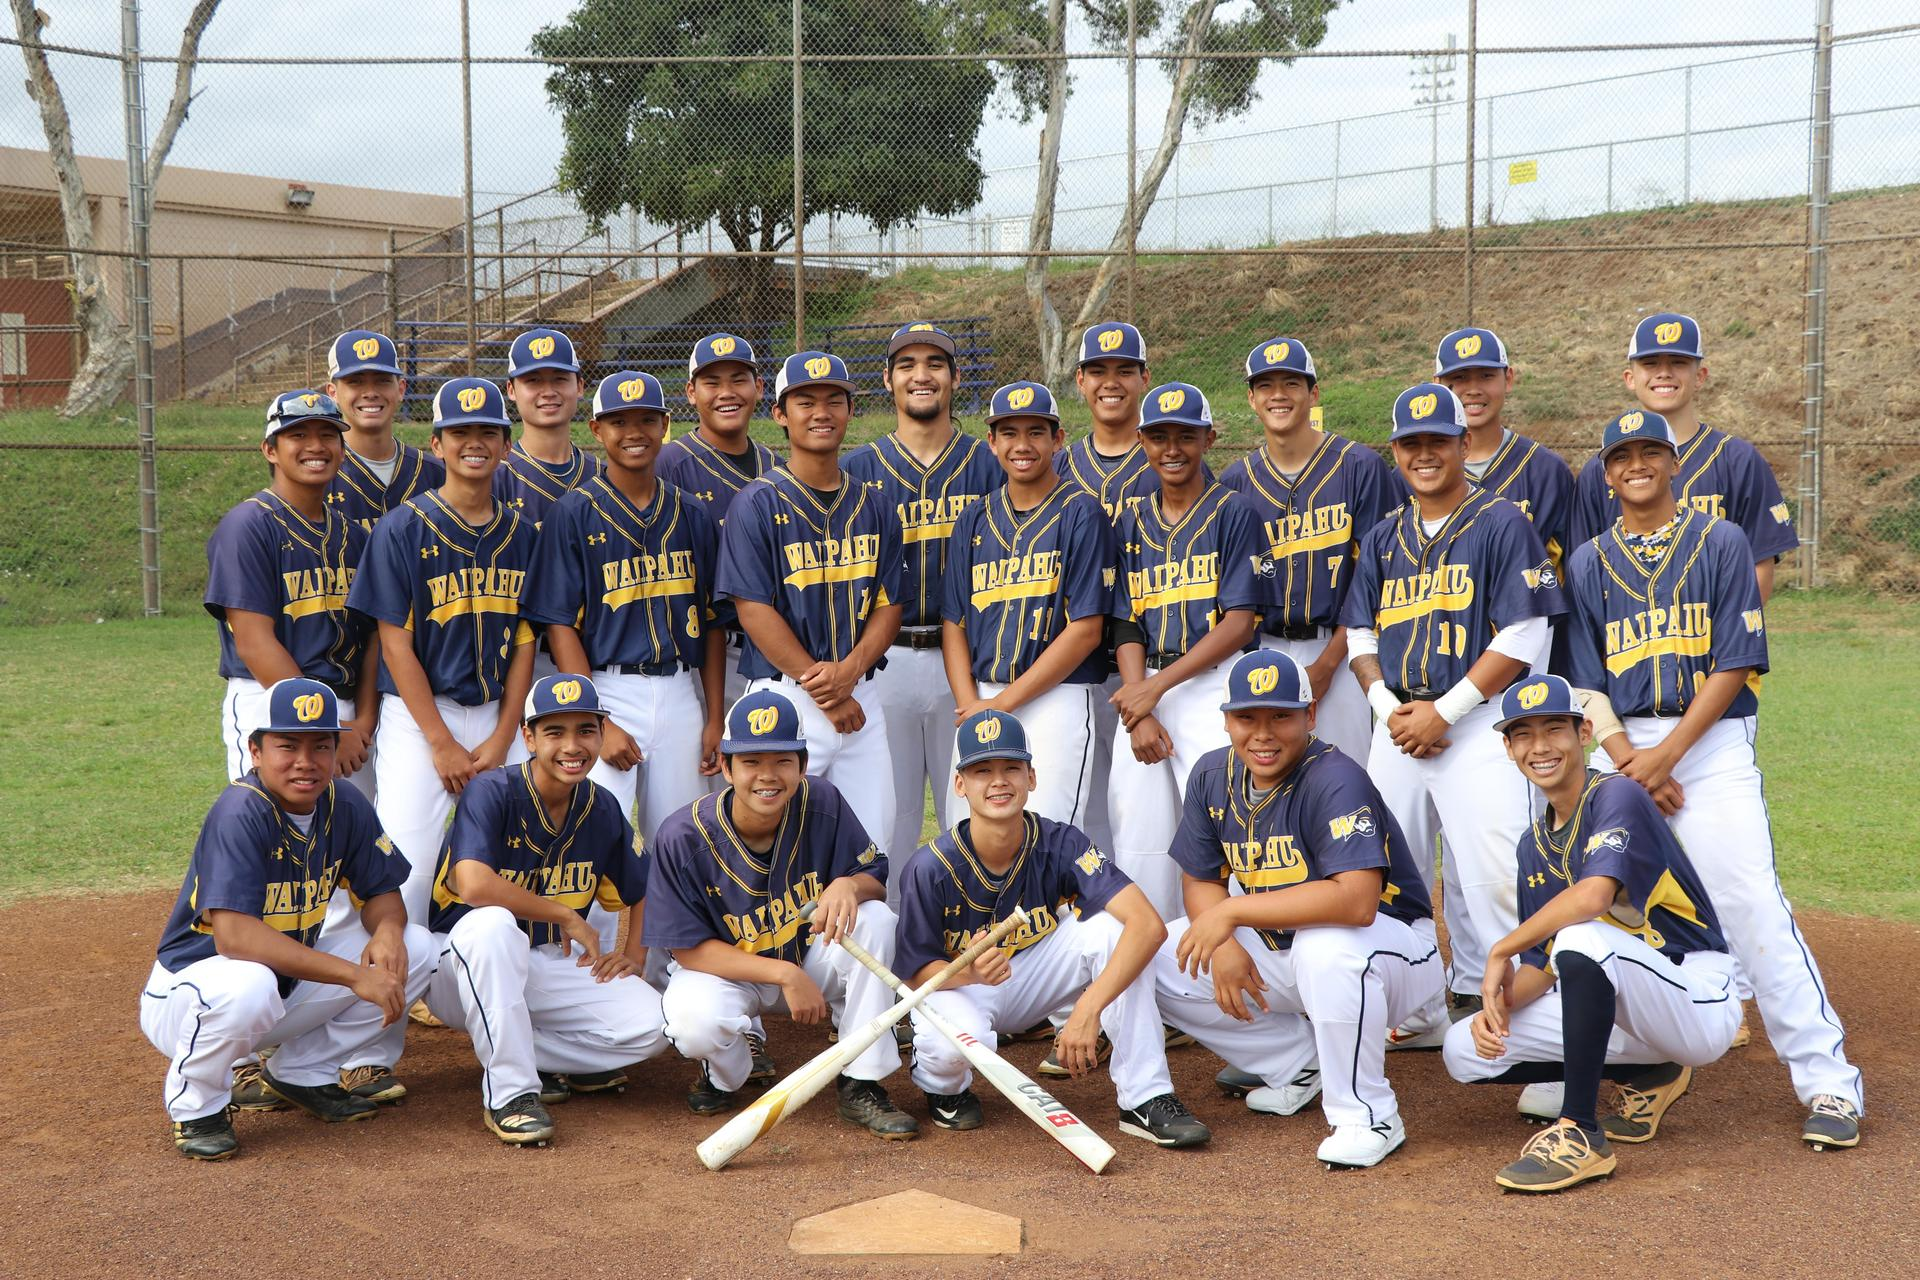 Boys Baseball Team (Varsity)